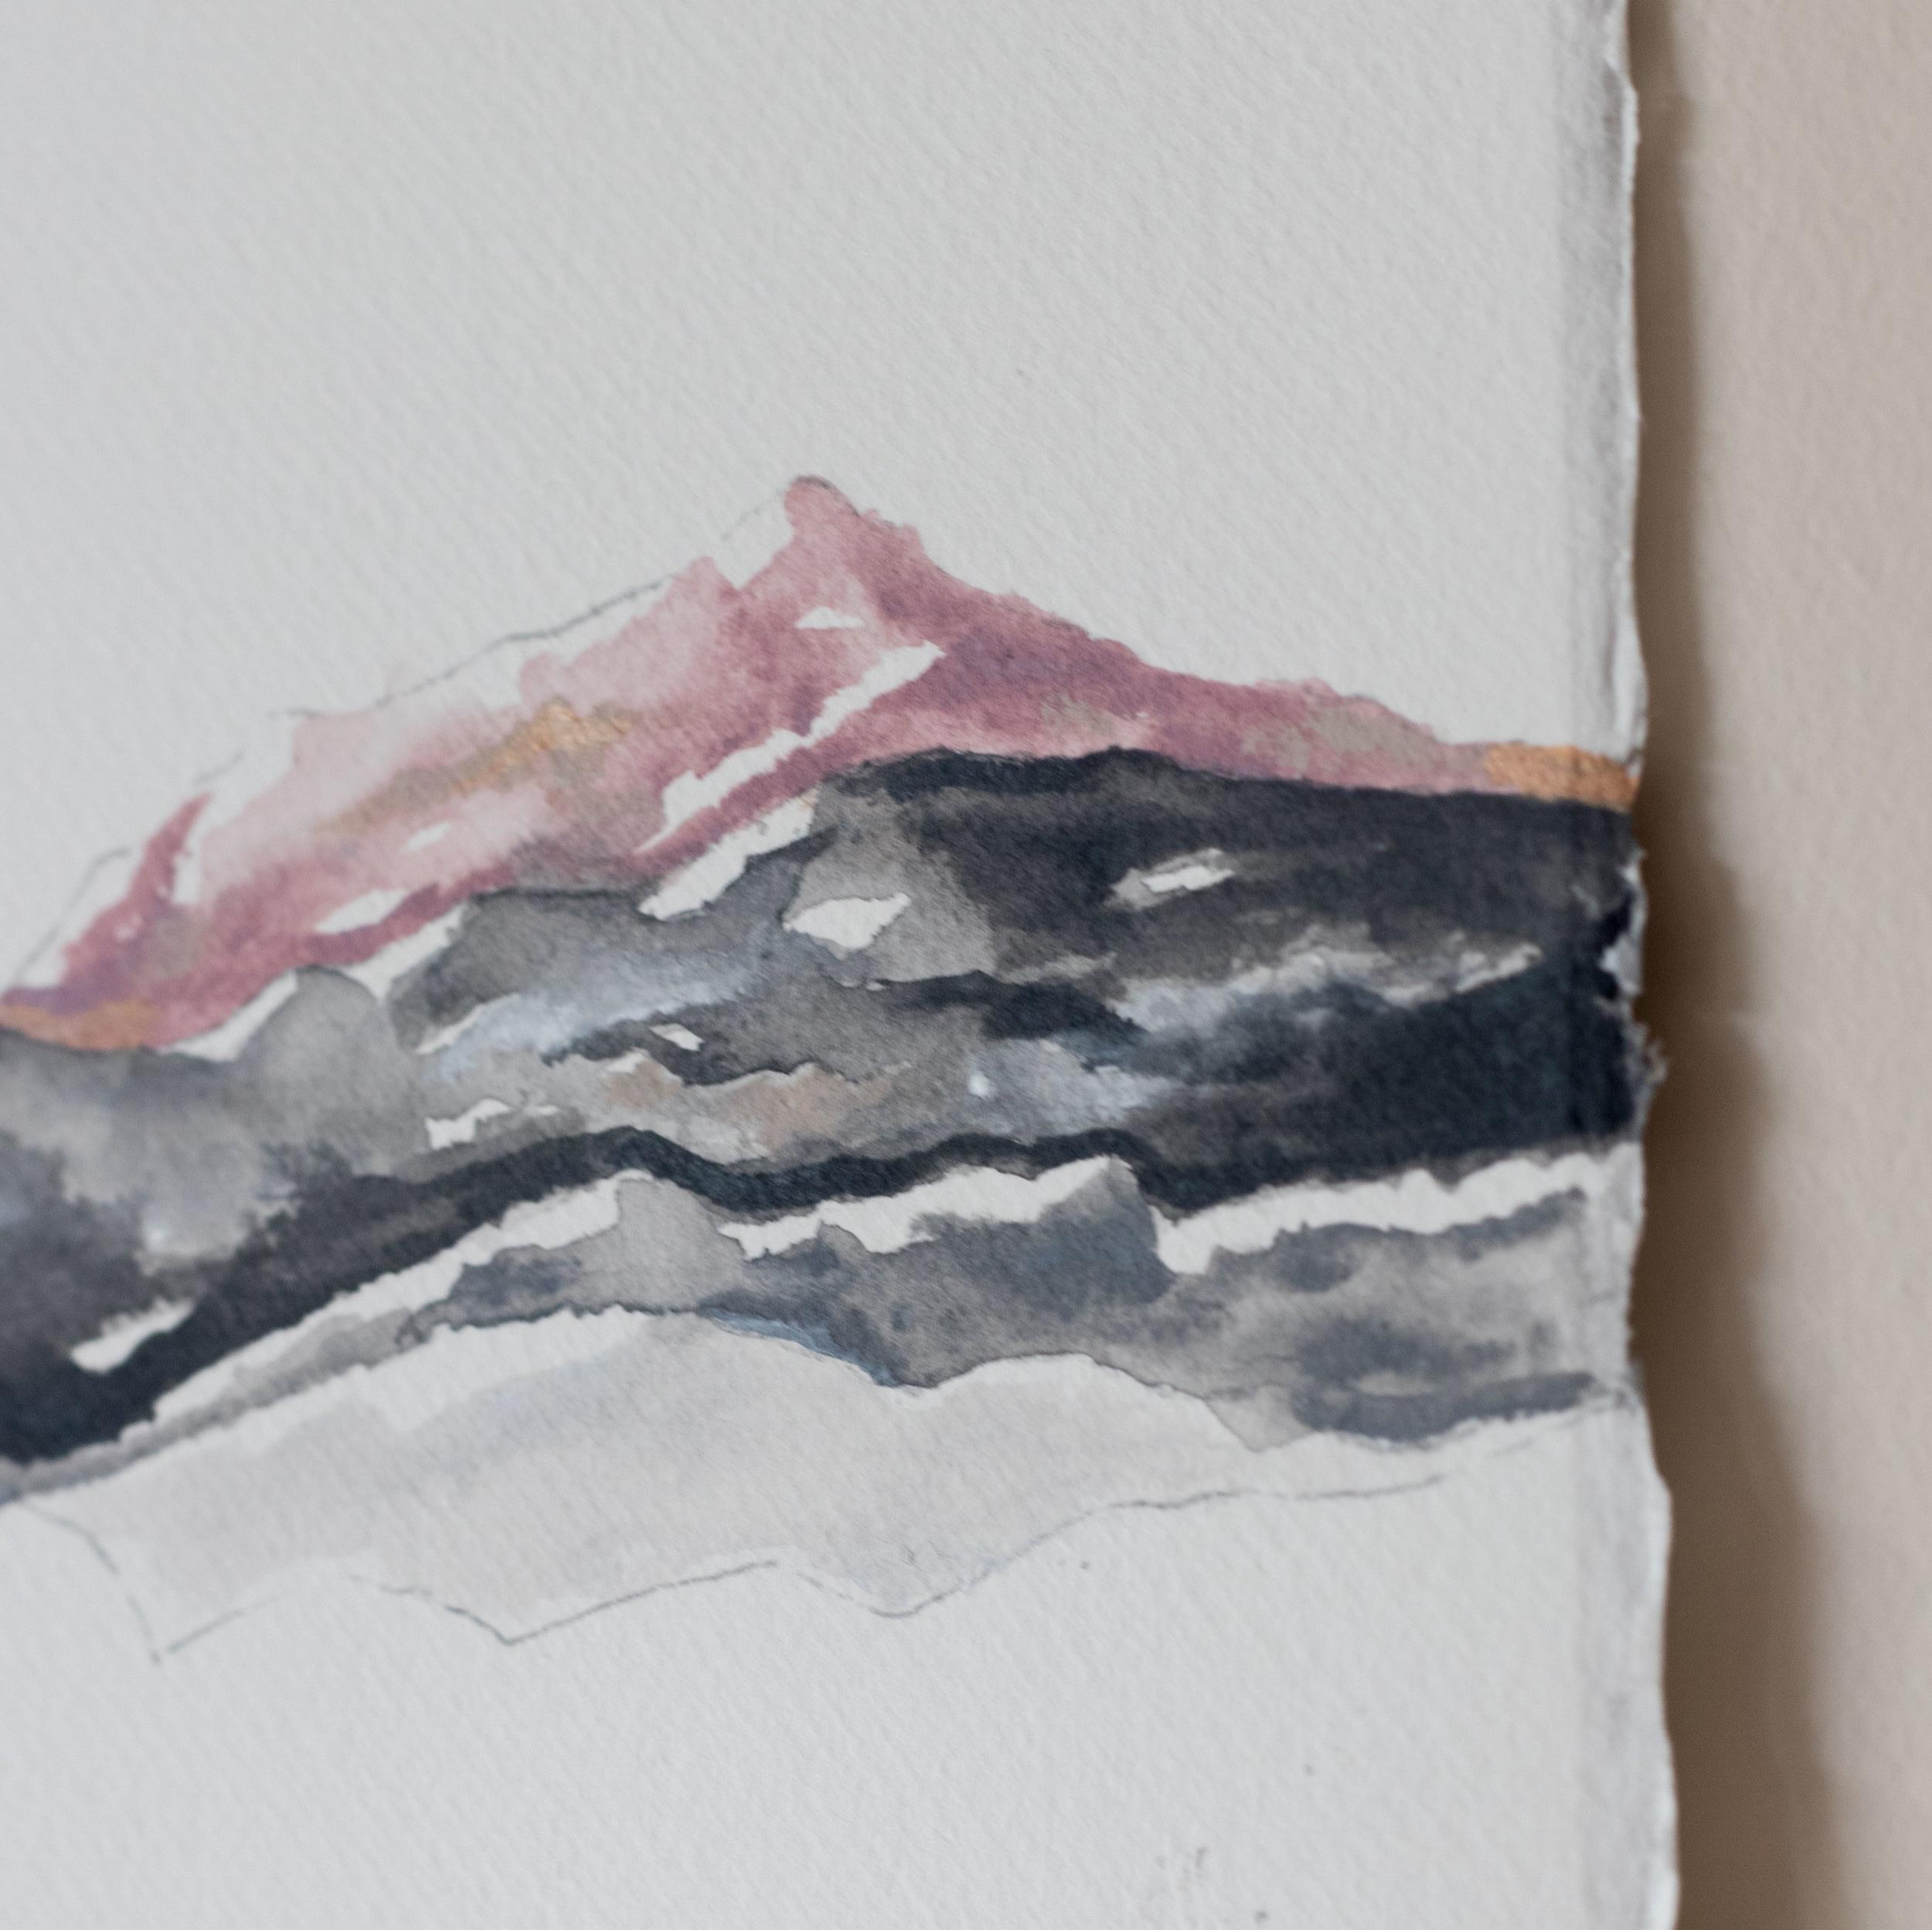 scandinavian_artwork_jenn_atkinson